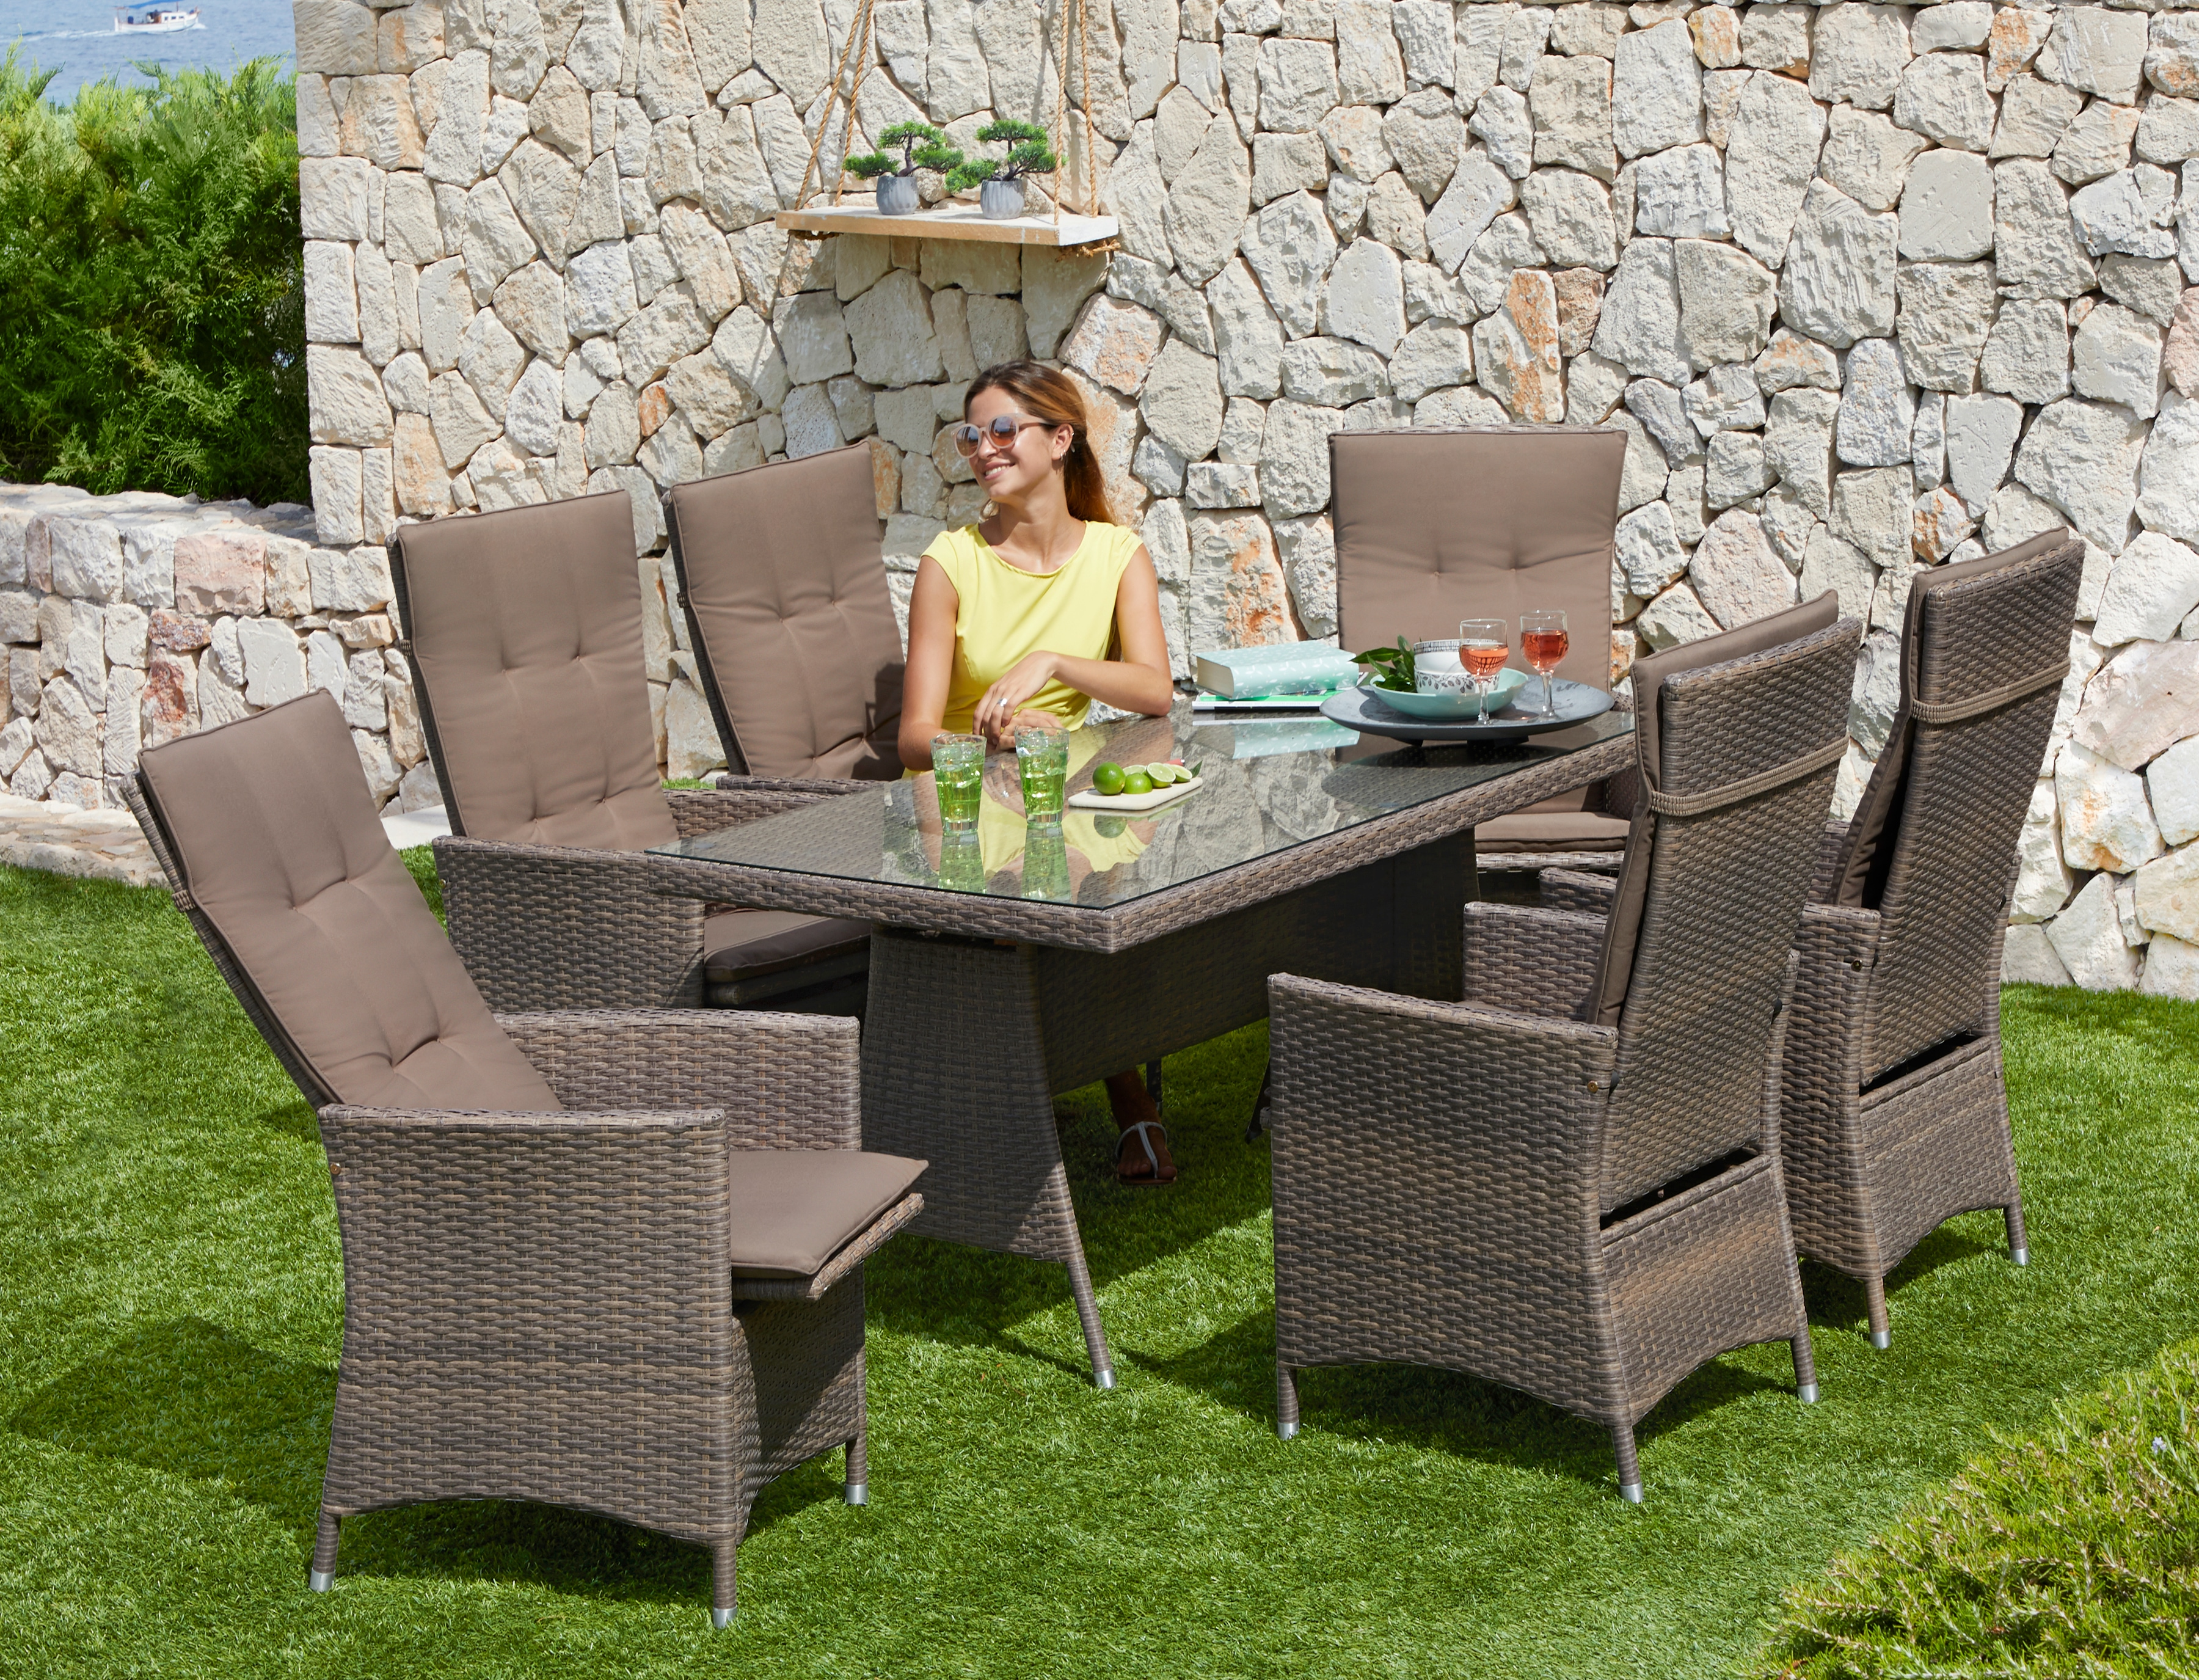 MERXX Gartenmöbelset Valencia 13-tlg 6 Relaxsessel Tisch 150x80 cm Polyrattan